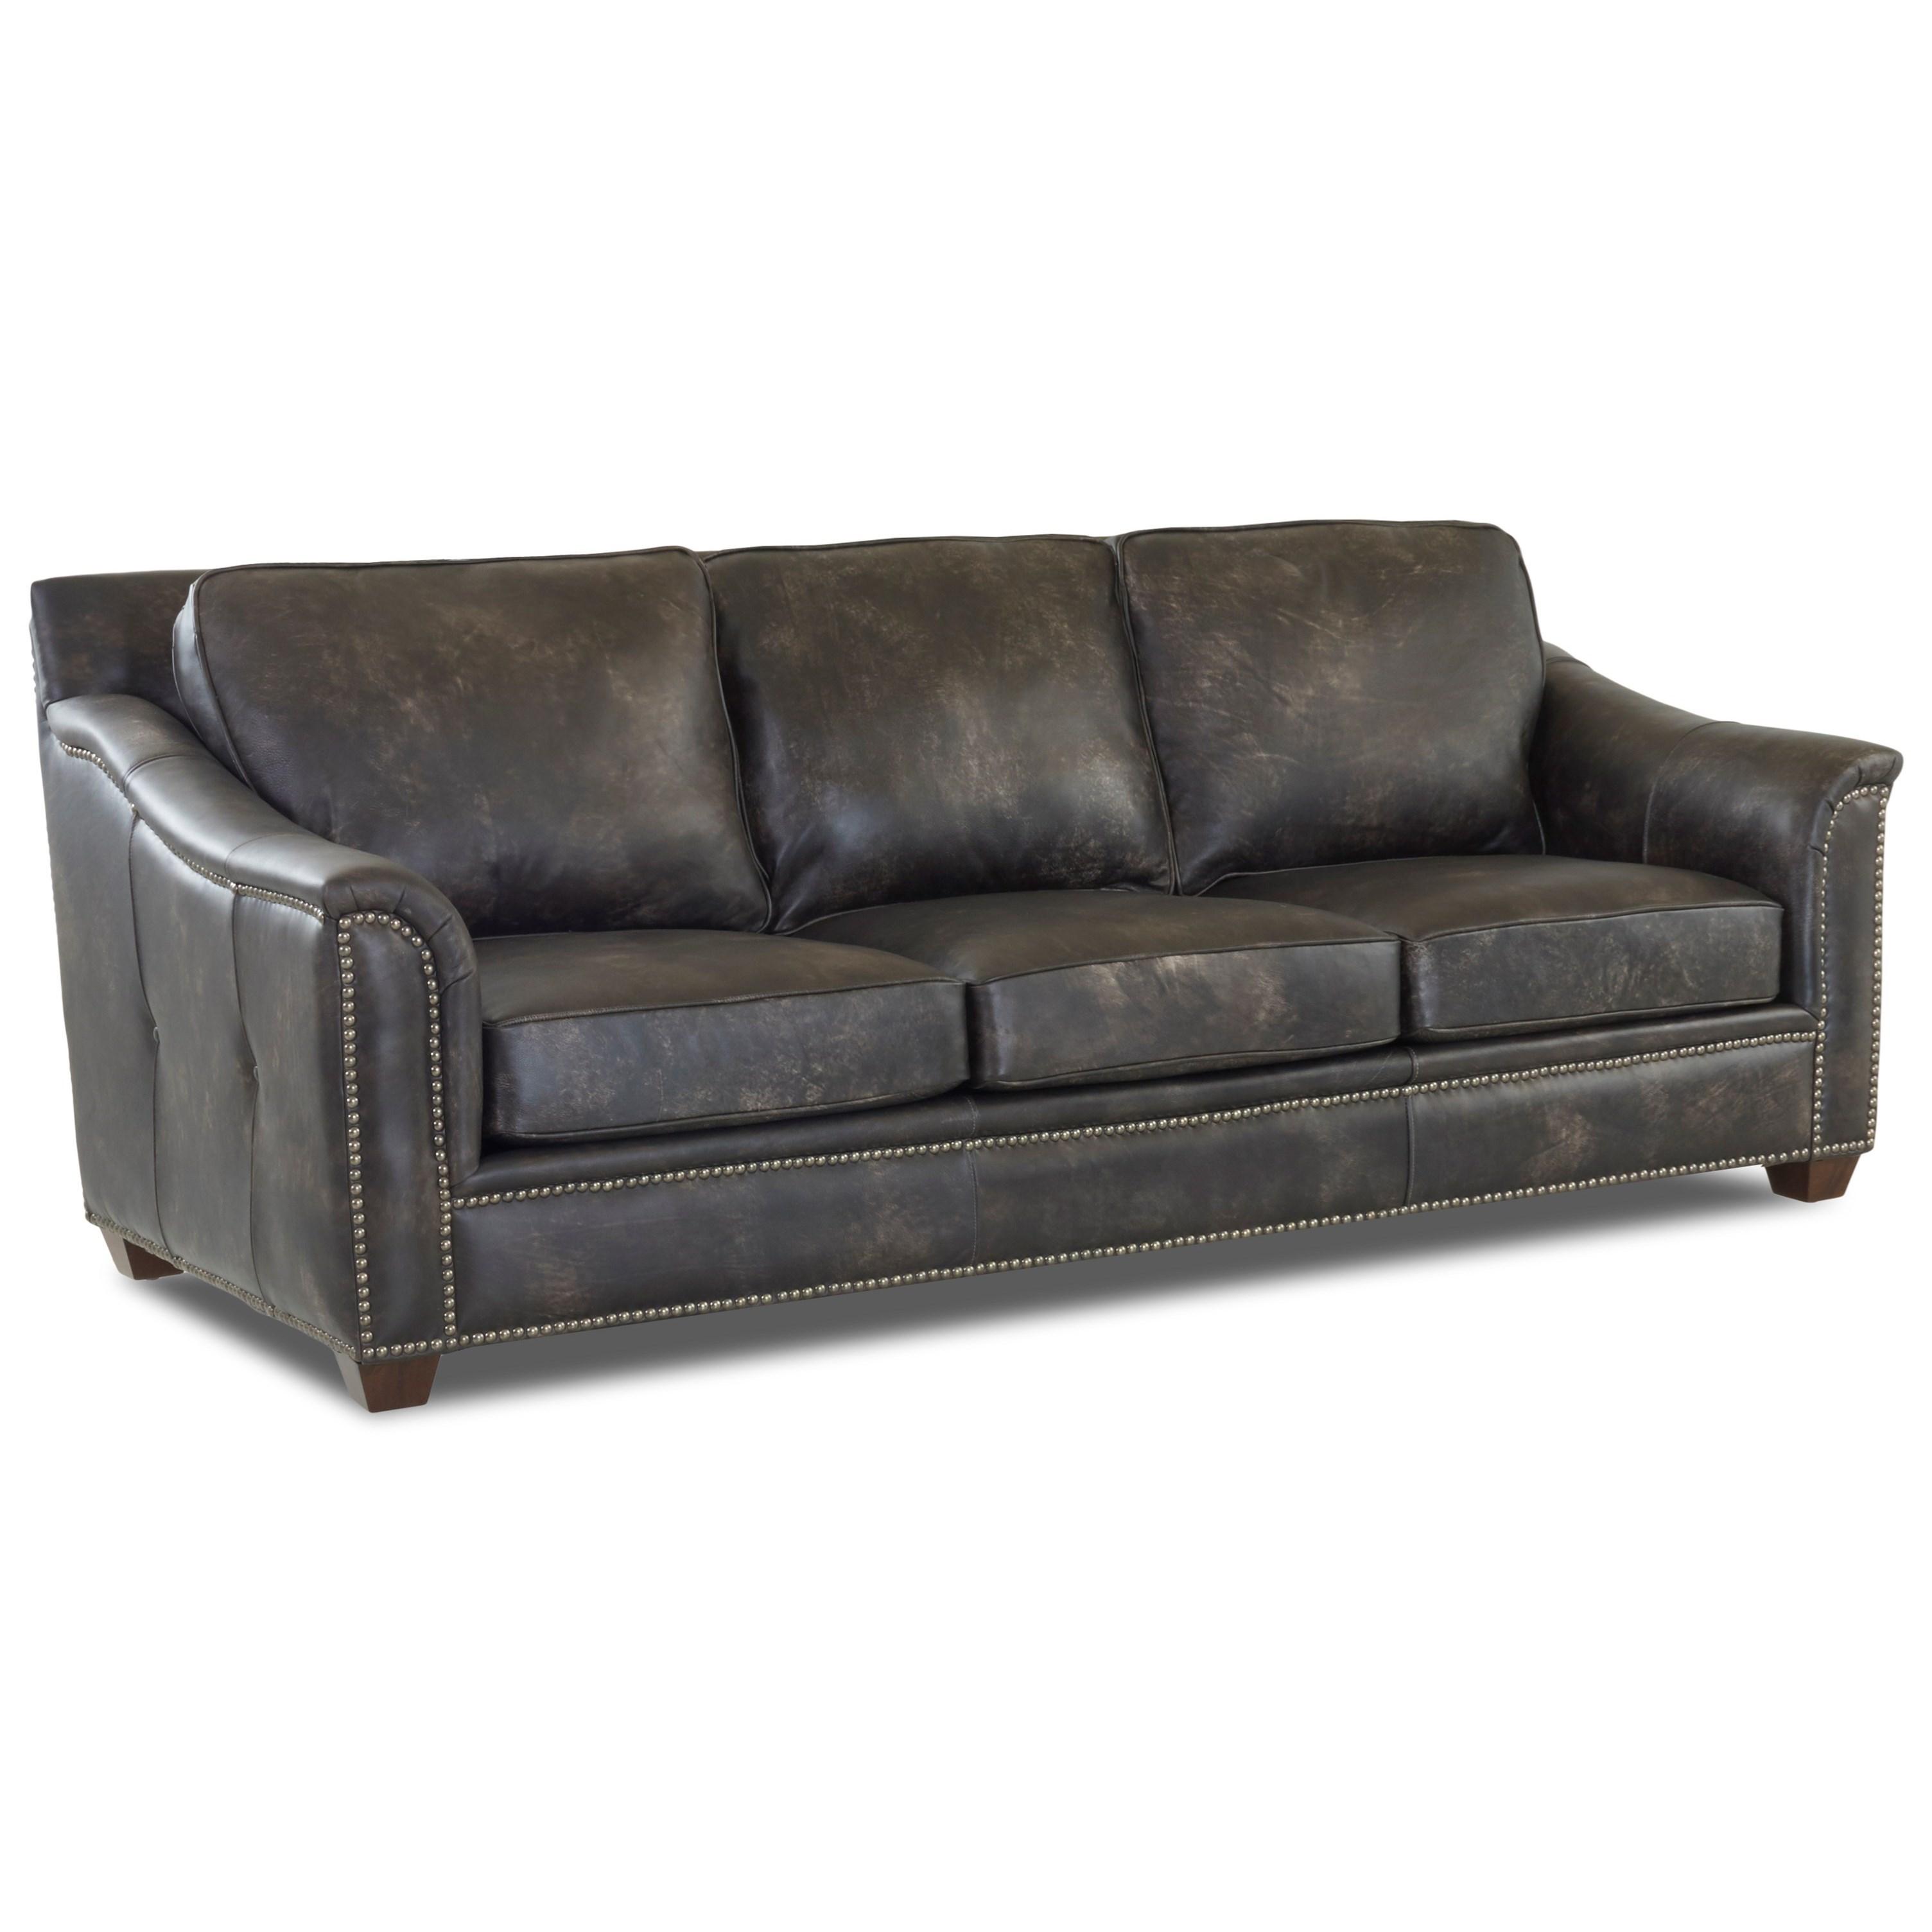 Klaussner Wilkesboro Ld43410 S Leather Sofa With Nailhead